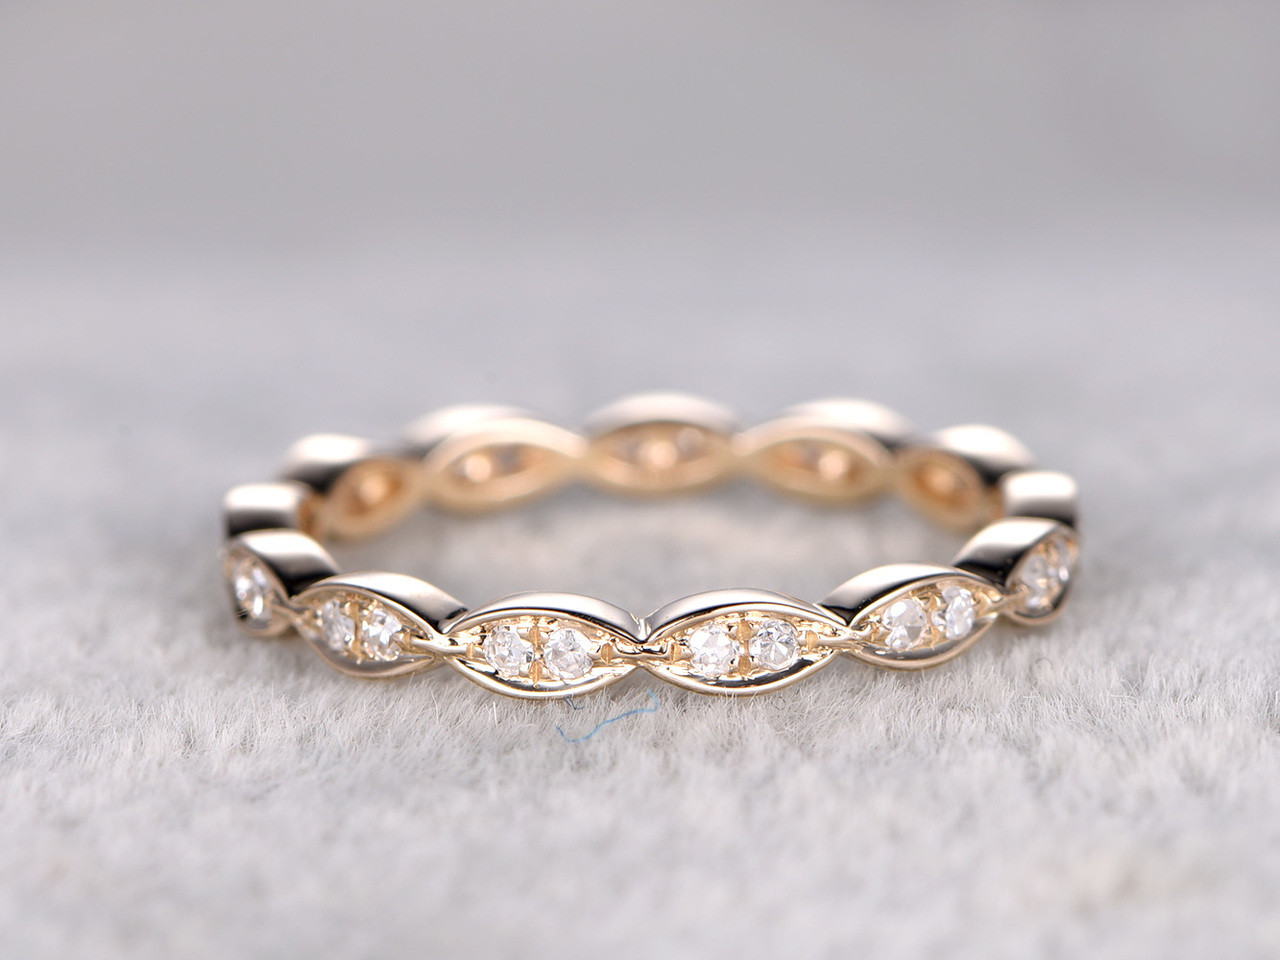 Round Diamond Wedding Ring 14k Yellow Gold Full Eternity Band